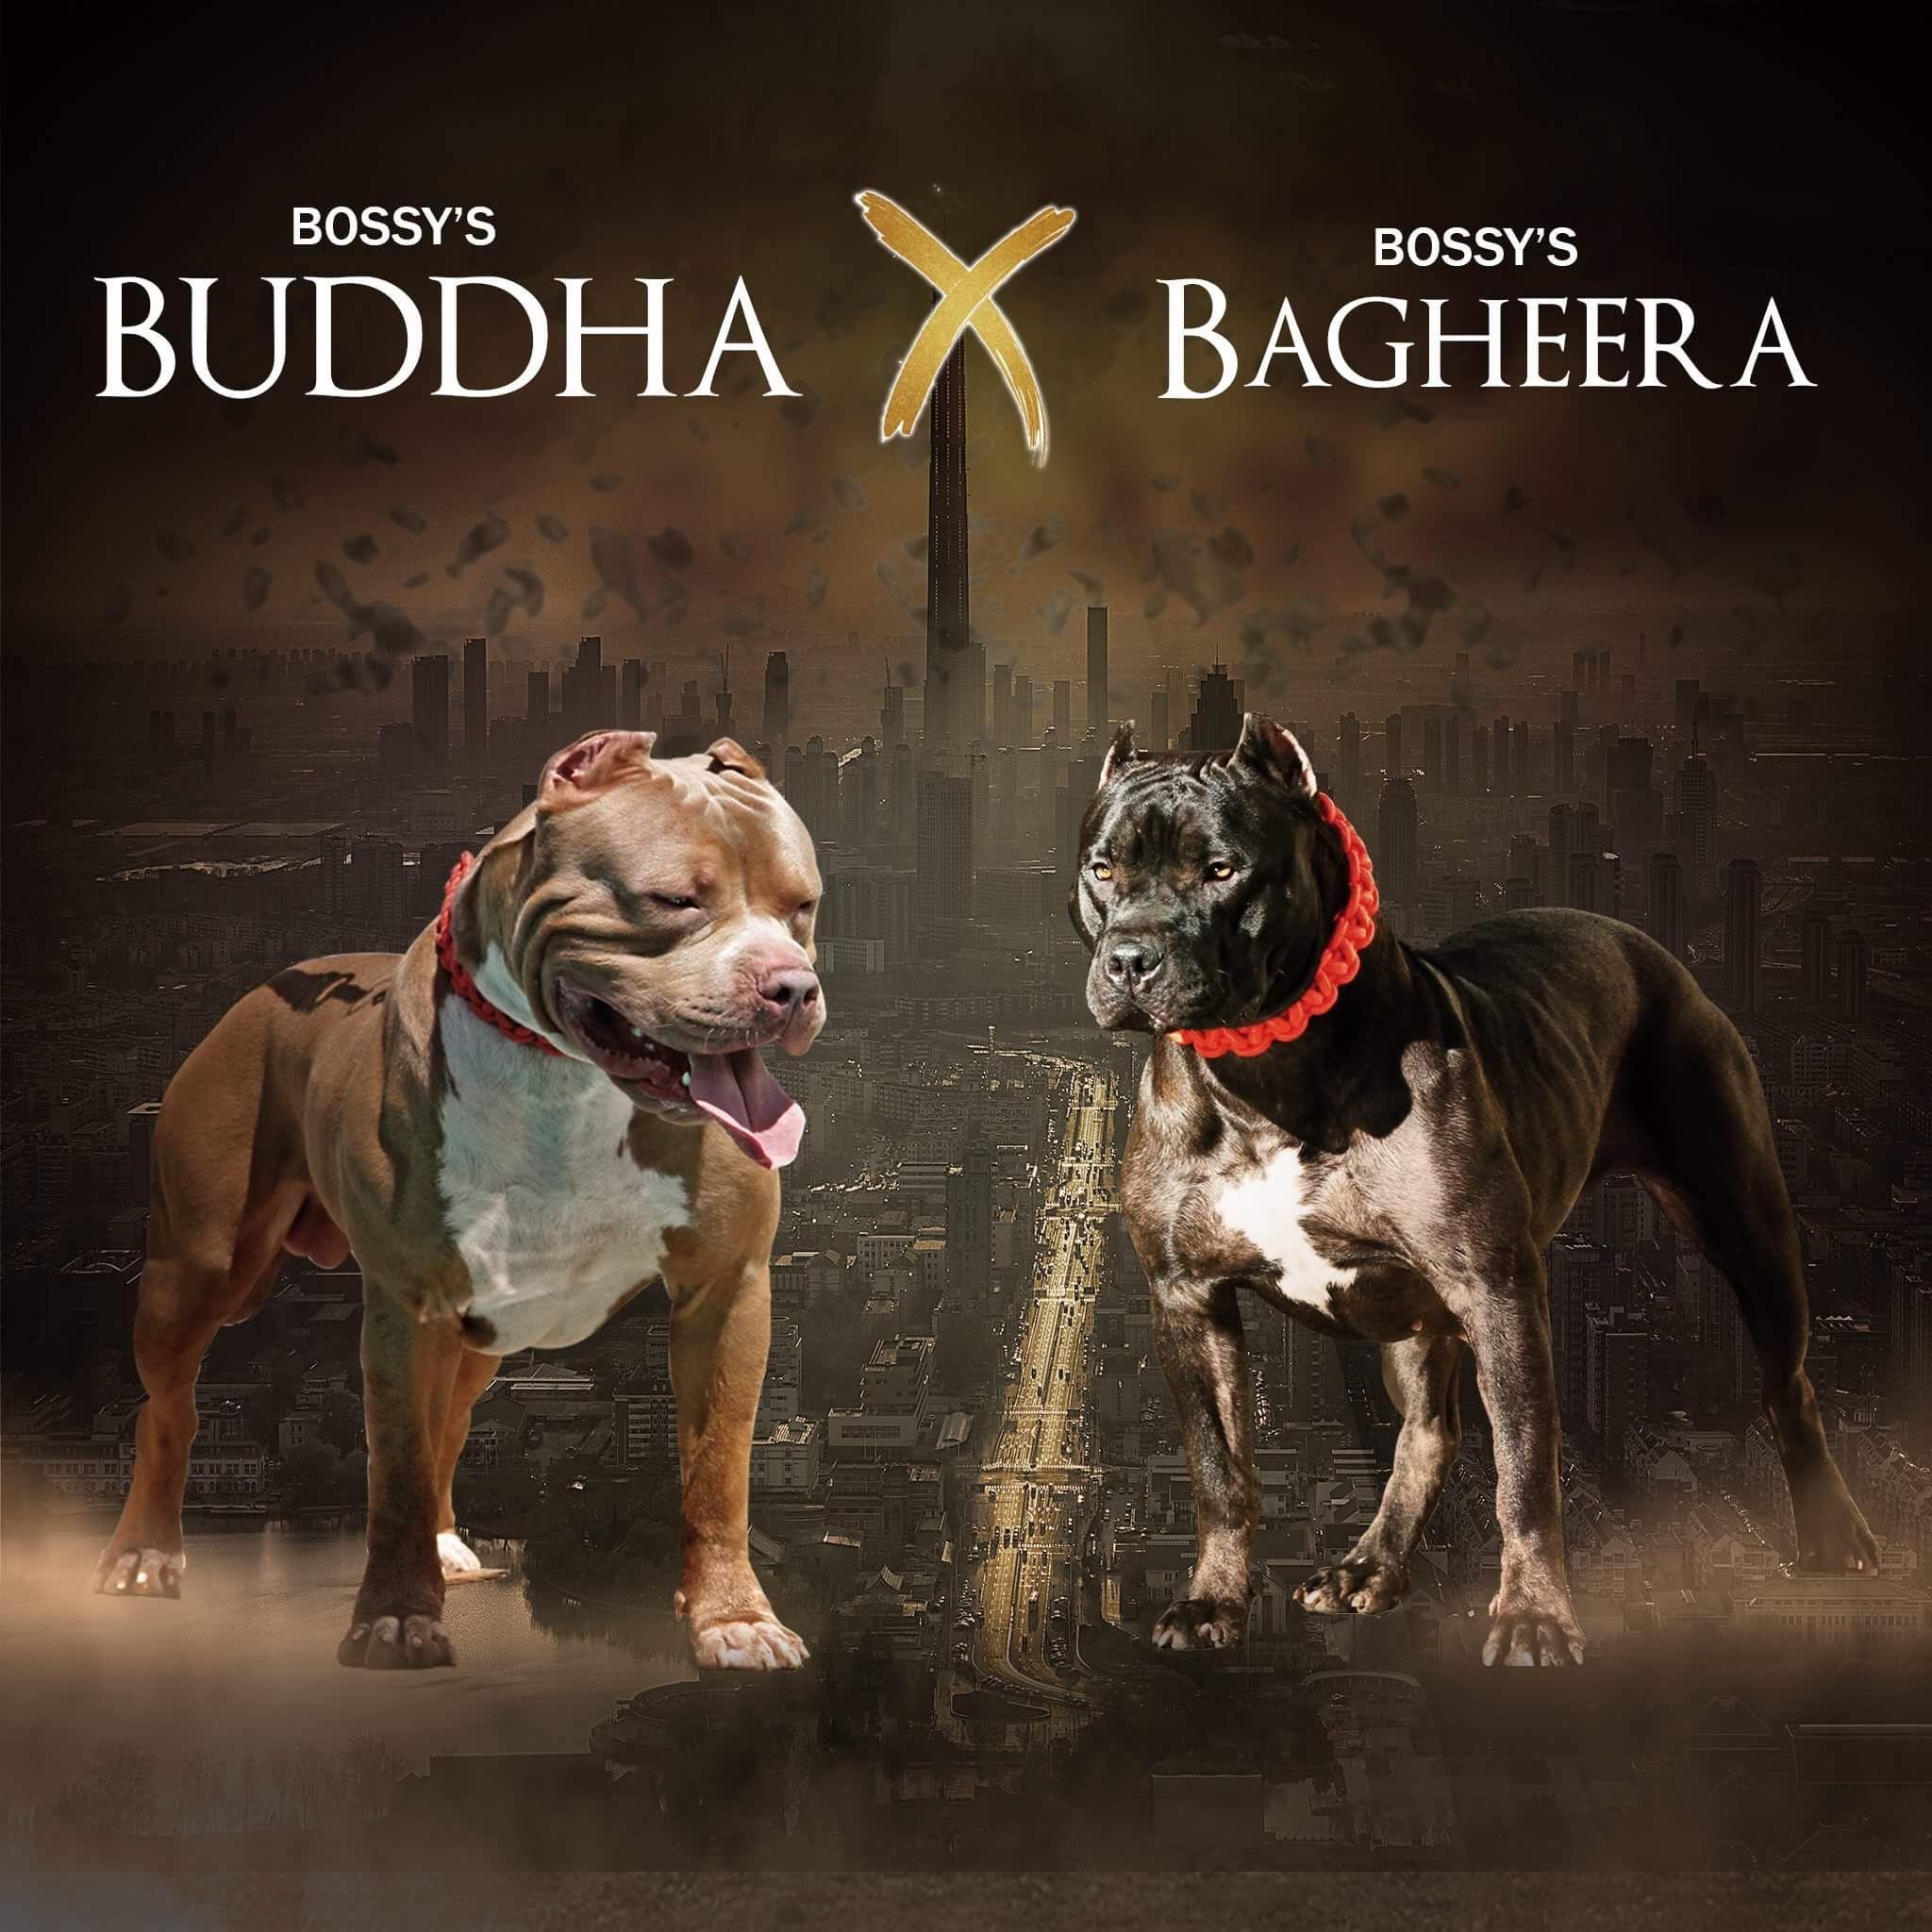 Buddha X Bagheera Pitbull Puppies Blue Pitbulls For Sale Kennel